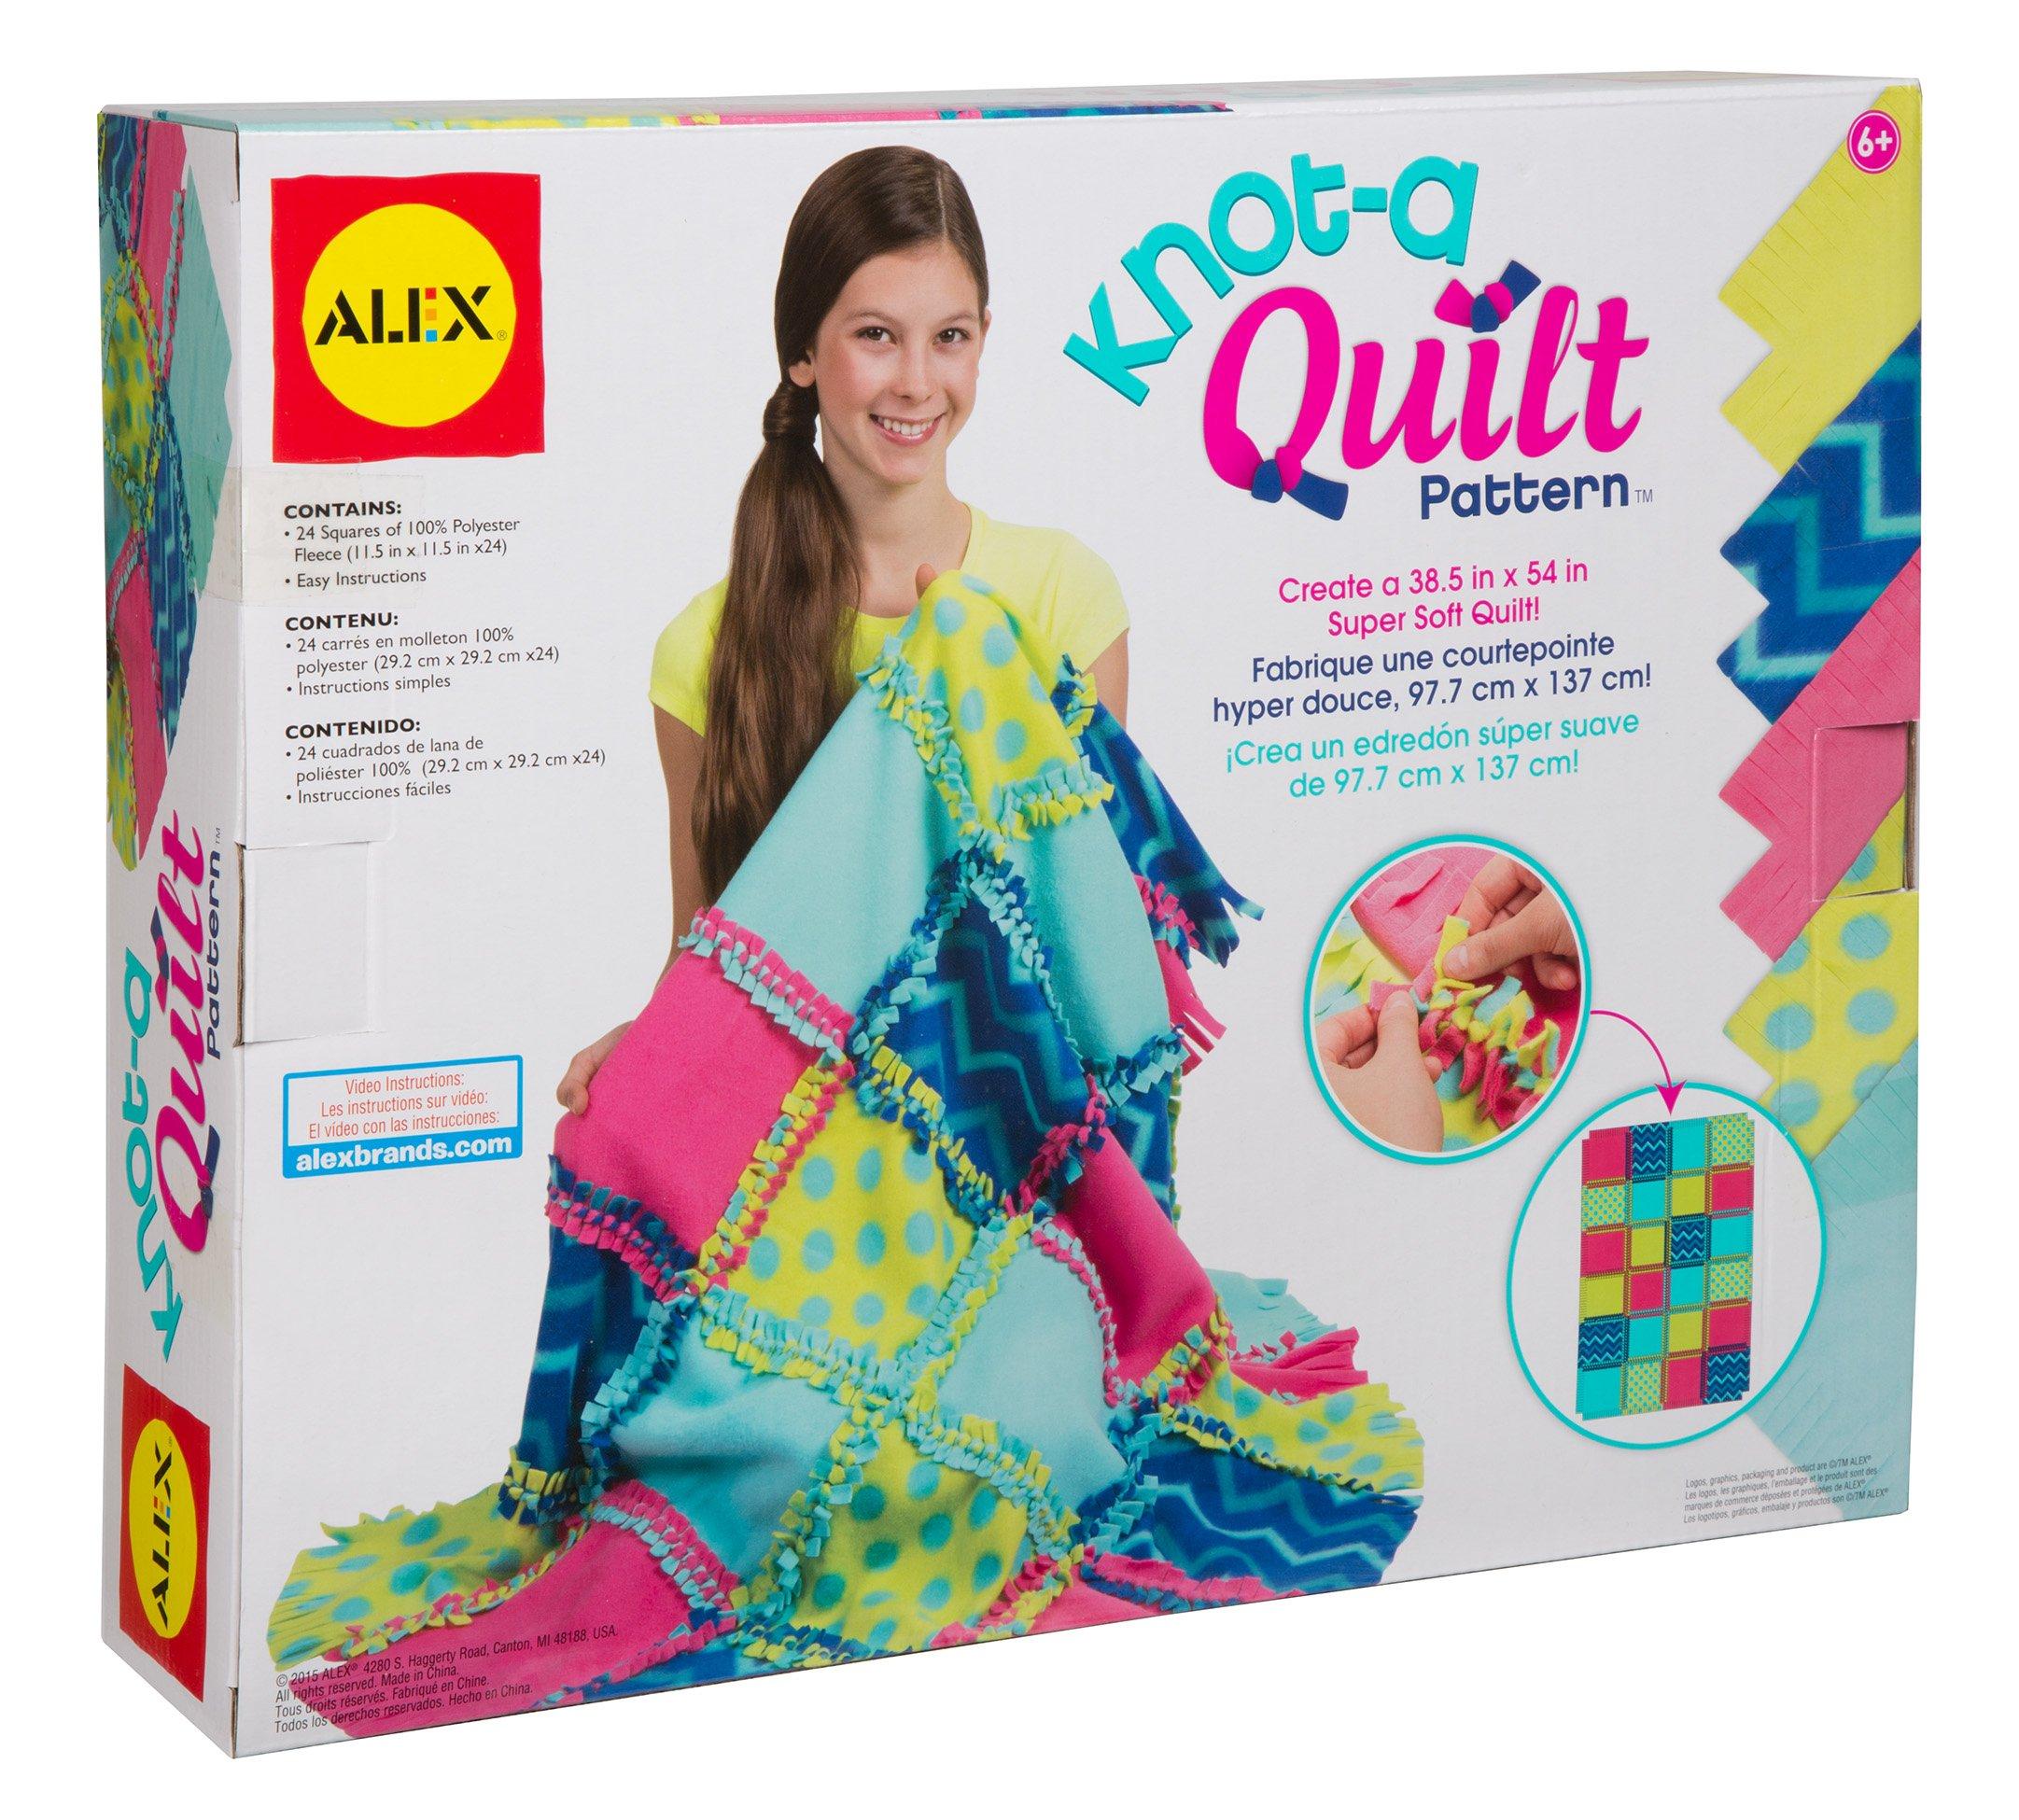 Alex Toys Craft Knot A Quilt Pattern Kit Ezgifthouse